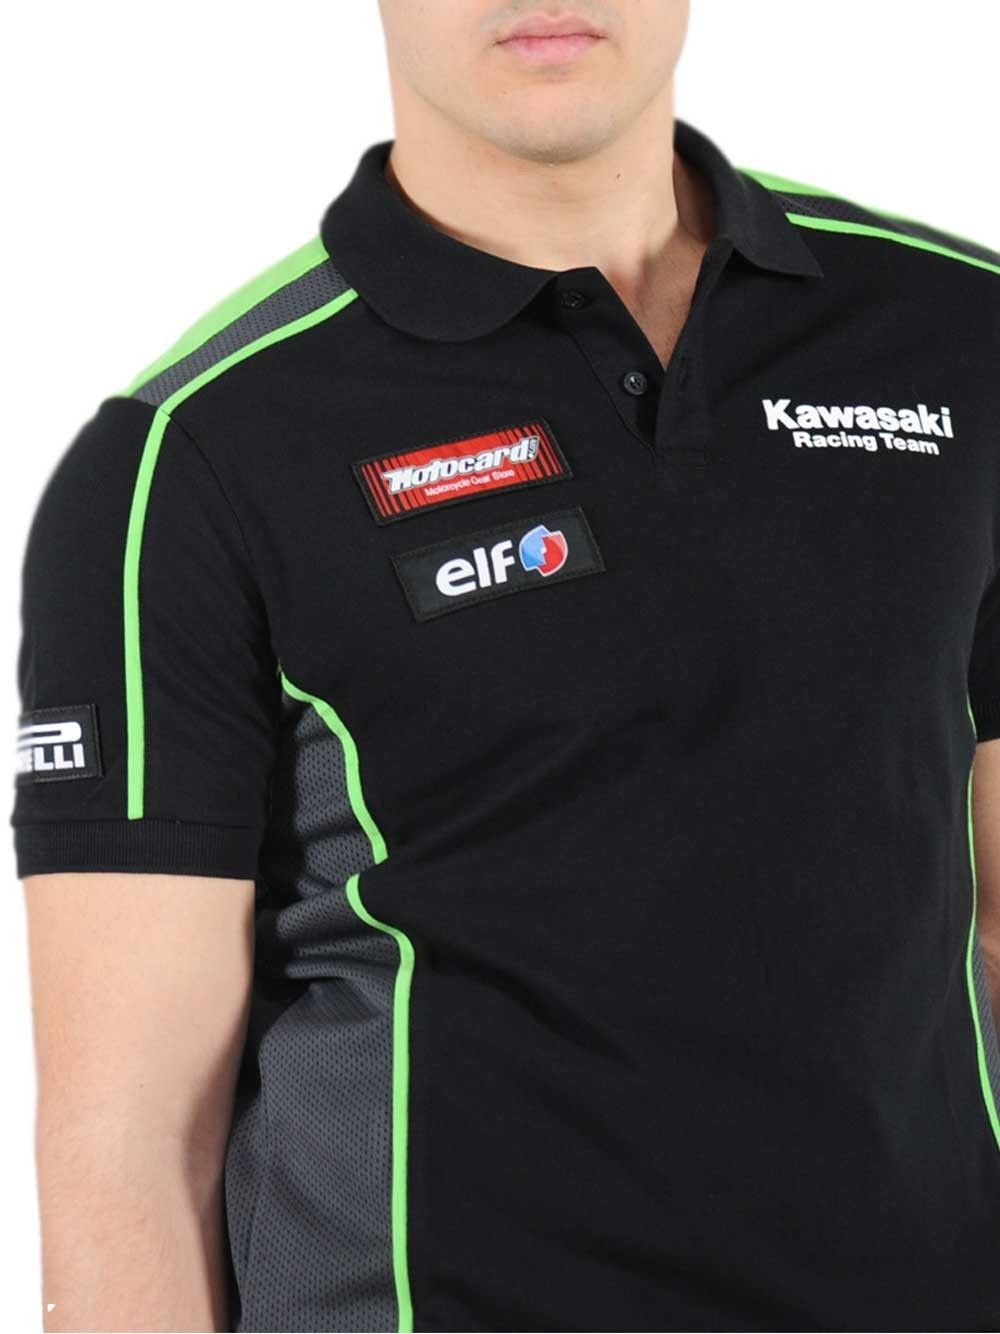 Kawasaki Motogp Racing Polo T Shirt Blackgreen Motorcycle Riding